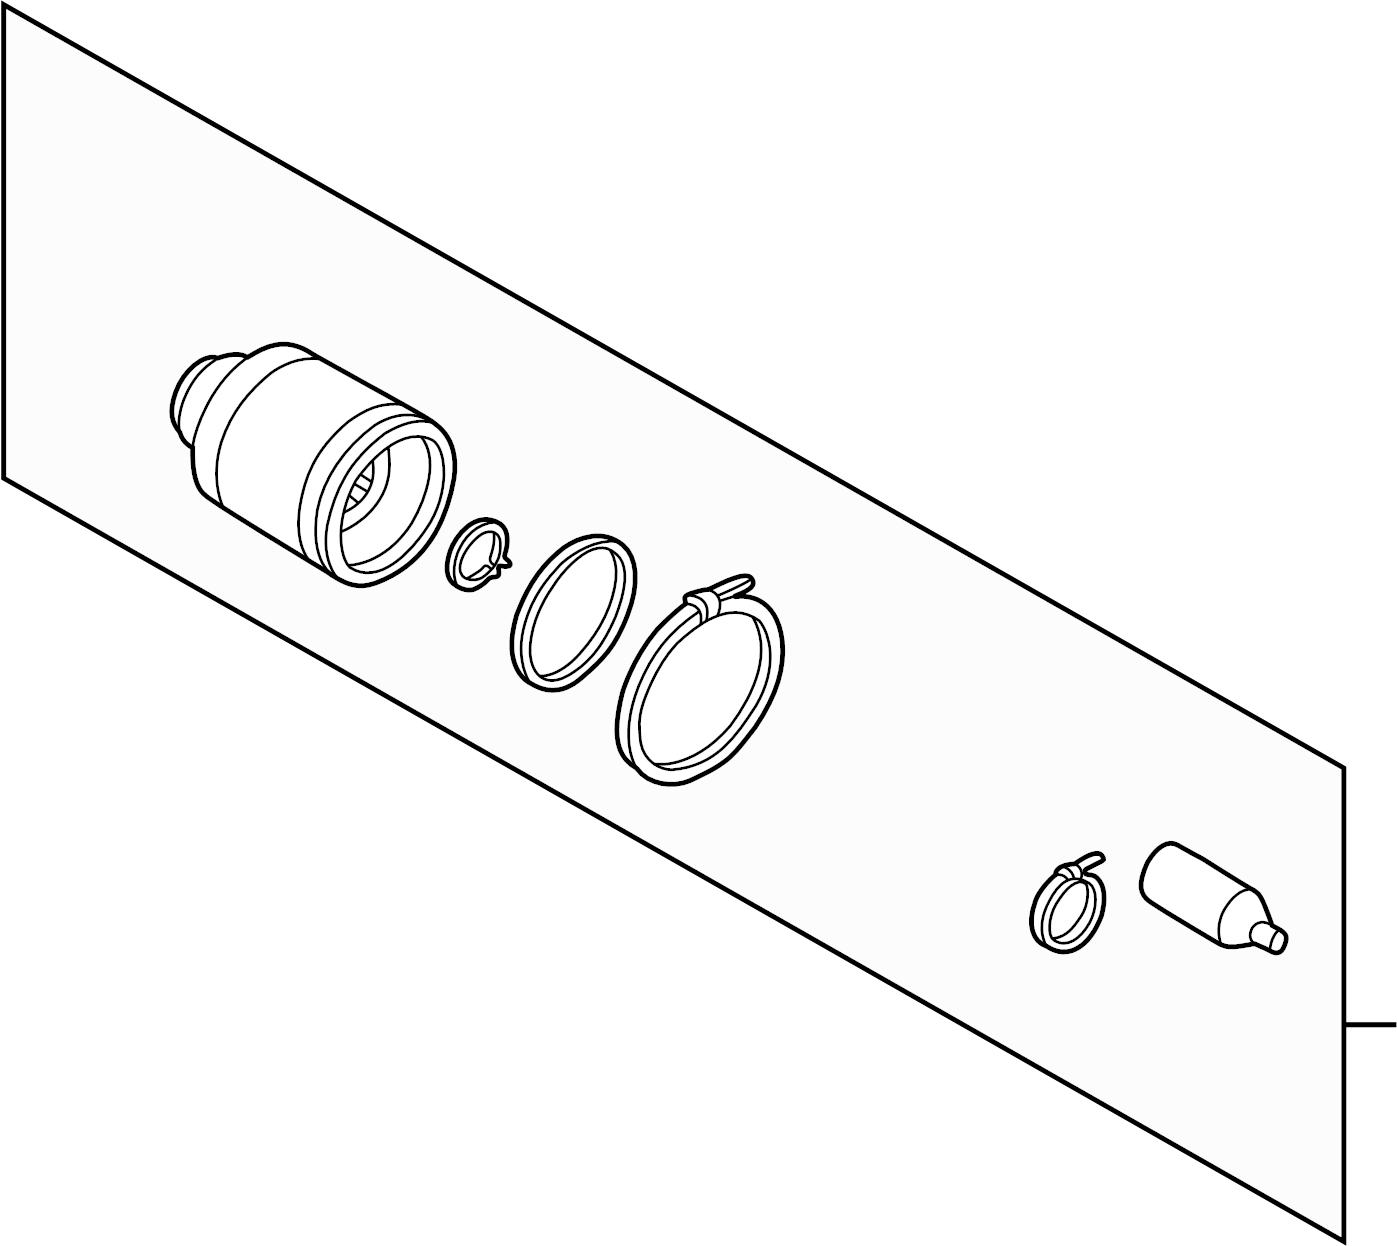 Subaru Impreza Doj Unit Kit Right Trans Auto Manual